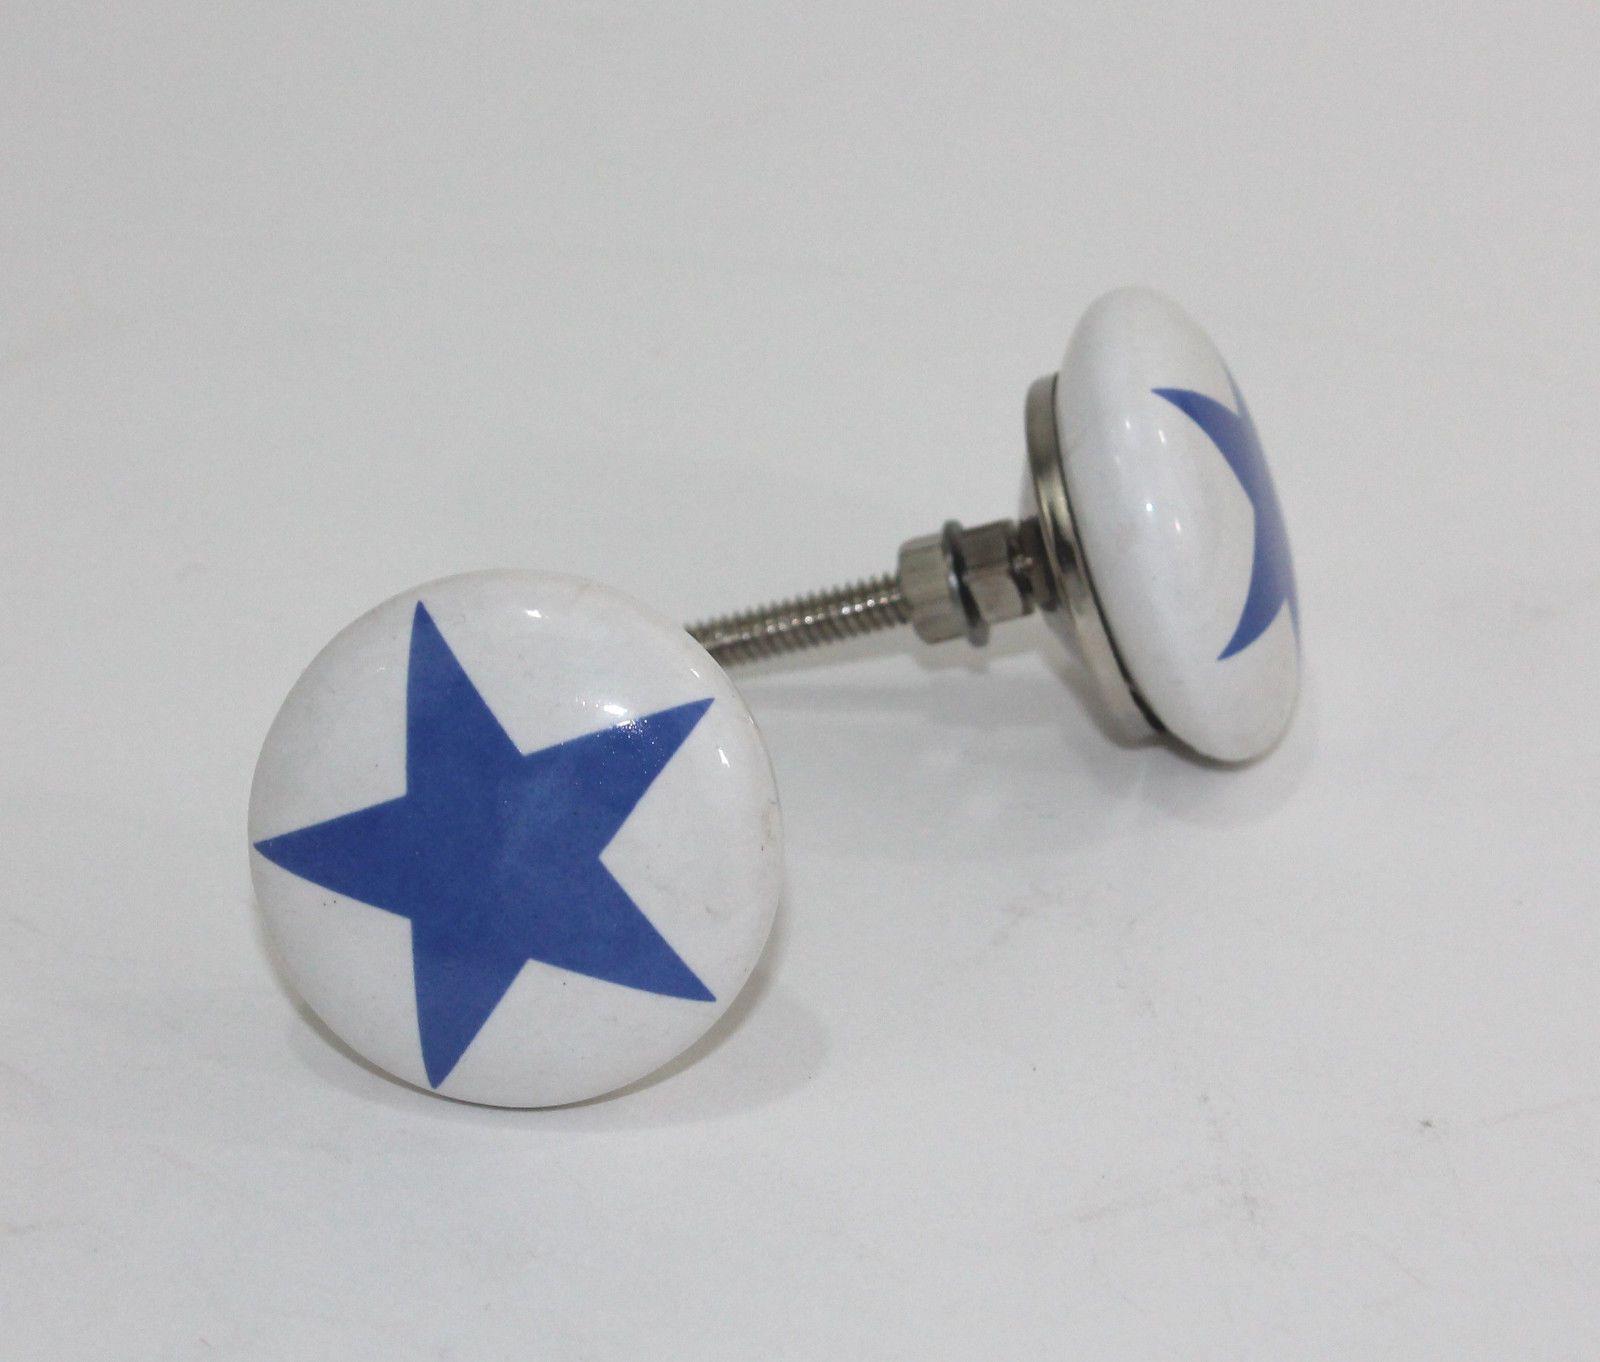 Mobelknopf Stern Blau Kommode Schrank Knauf Vintage